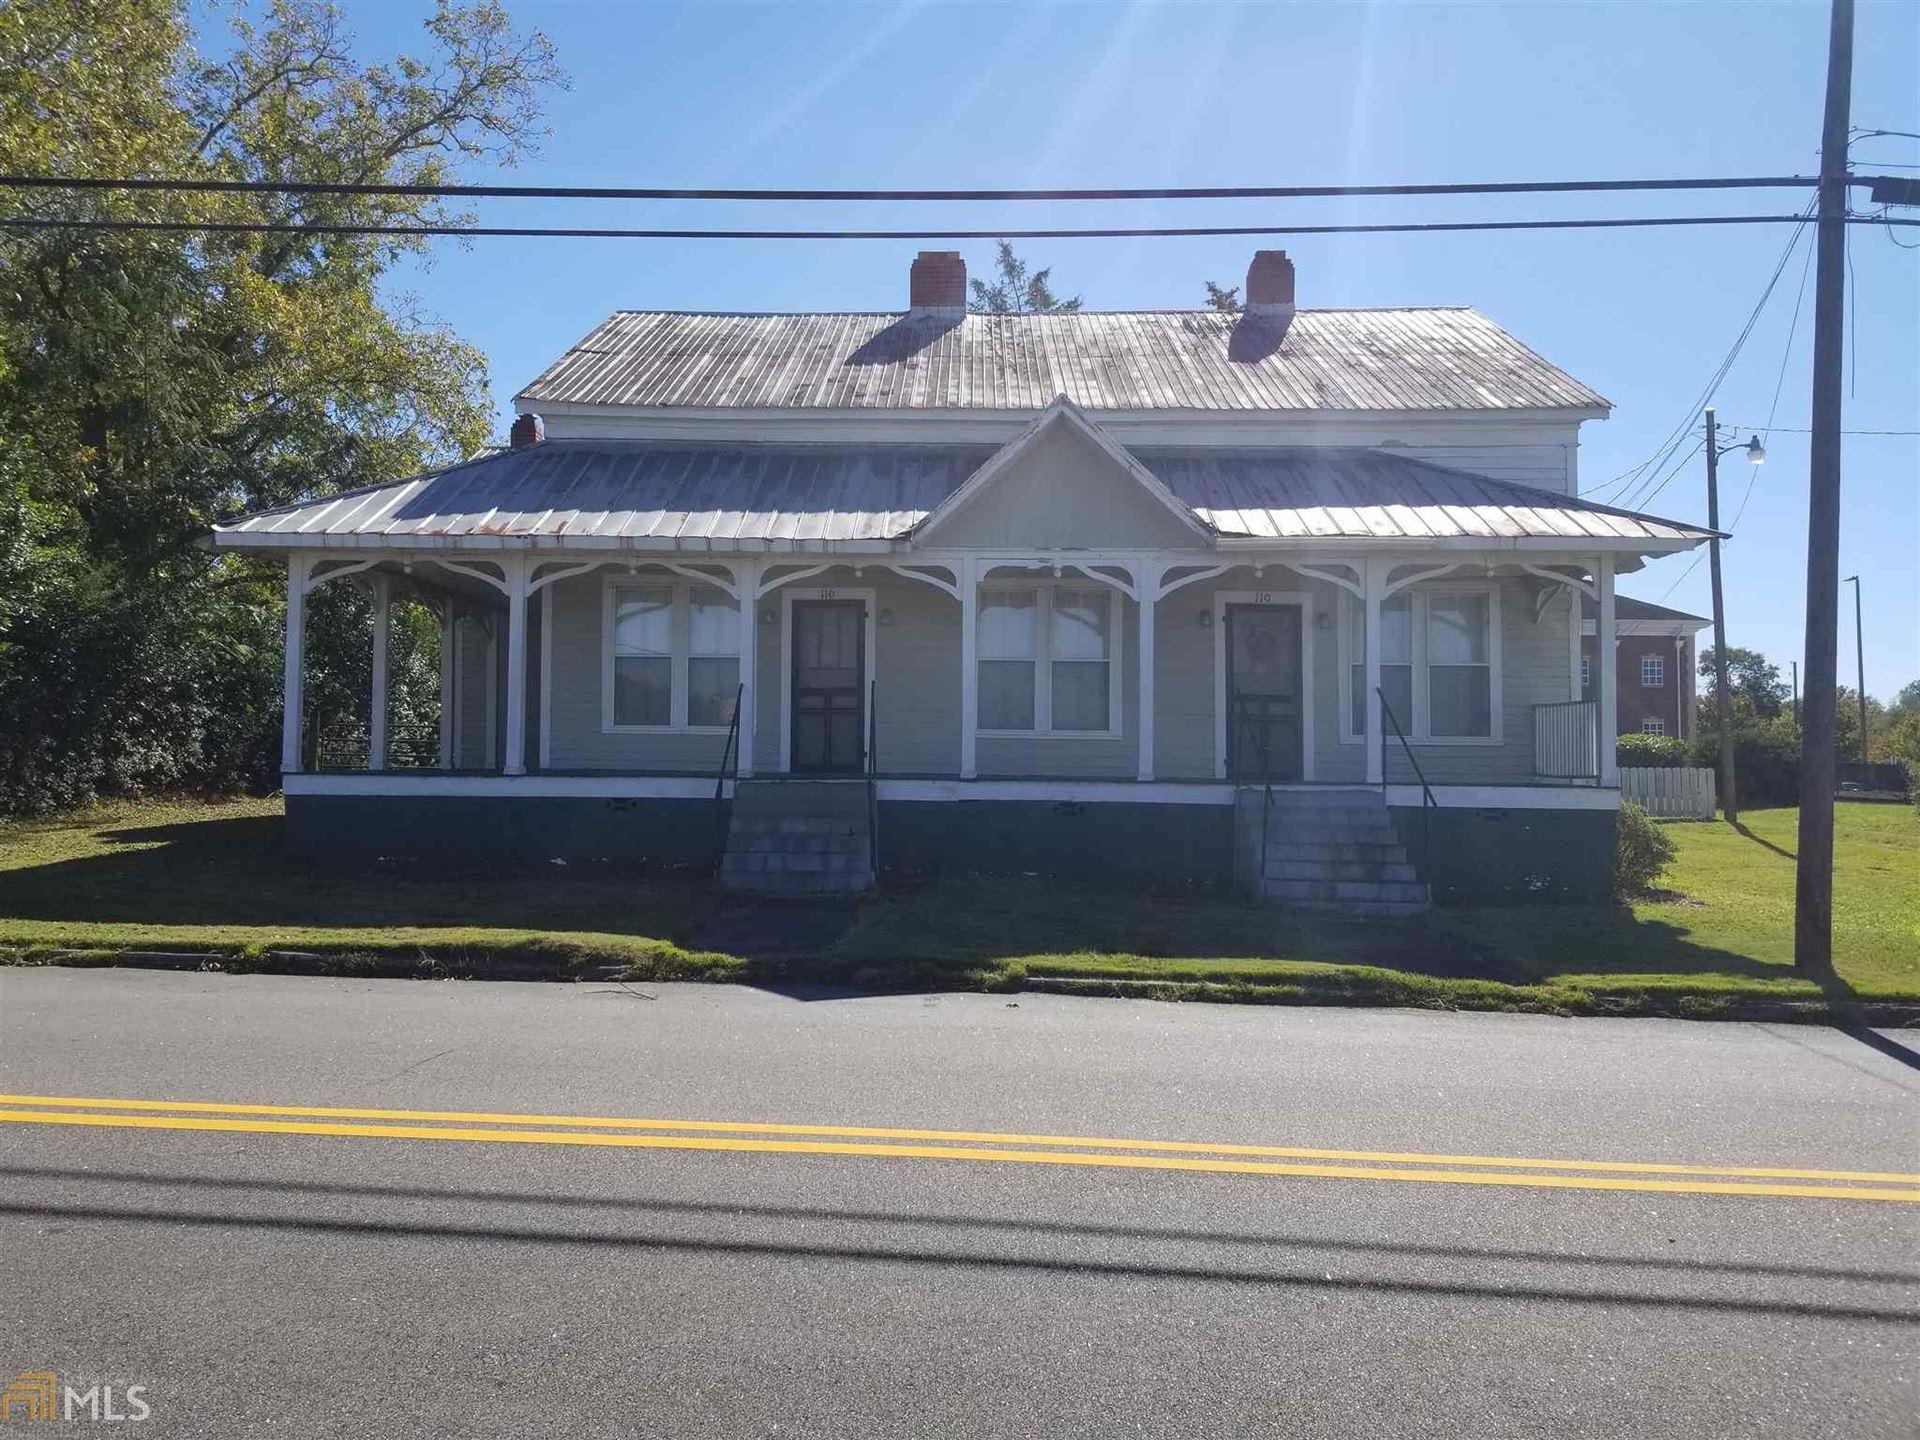 110\/116 Bulloch St, Statesboro, GA 30458 - #: 8886046